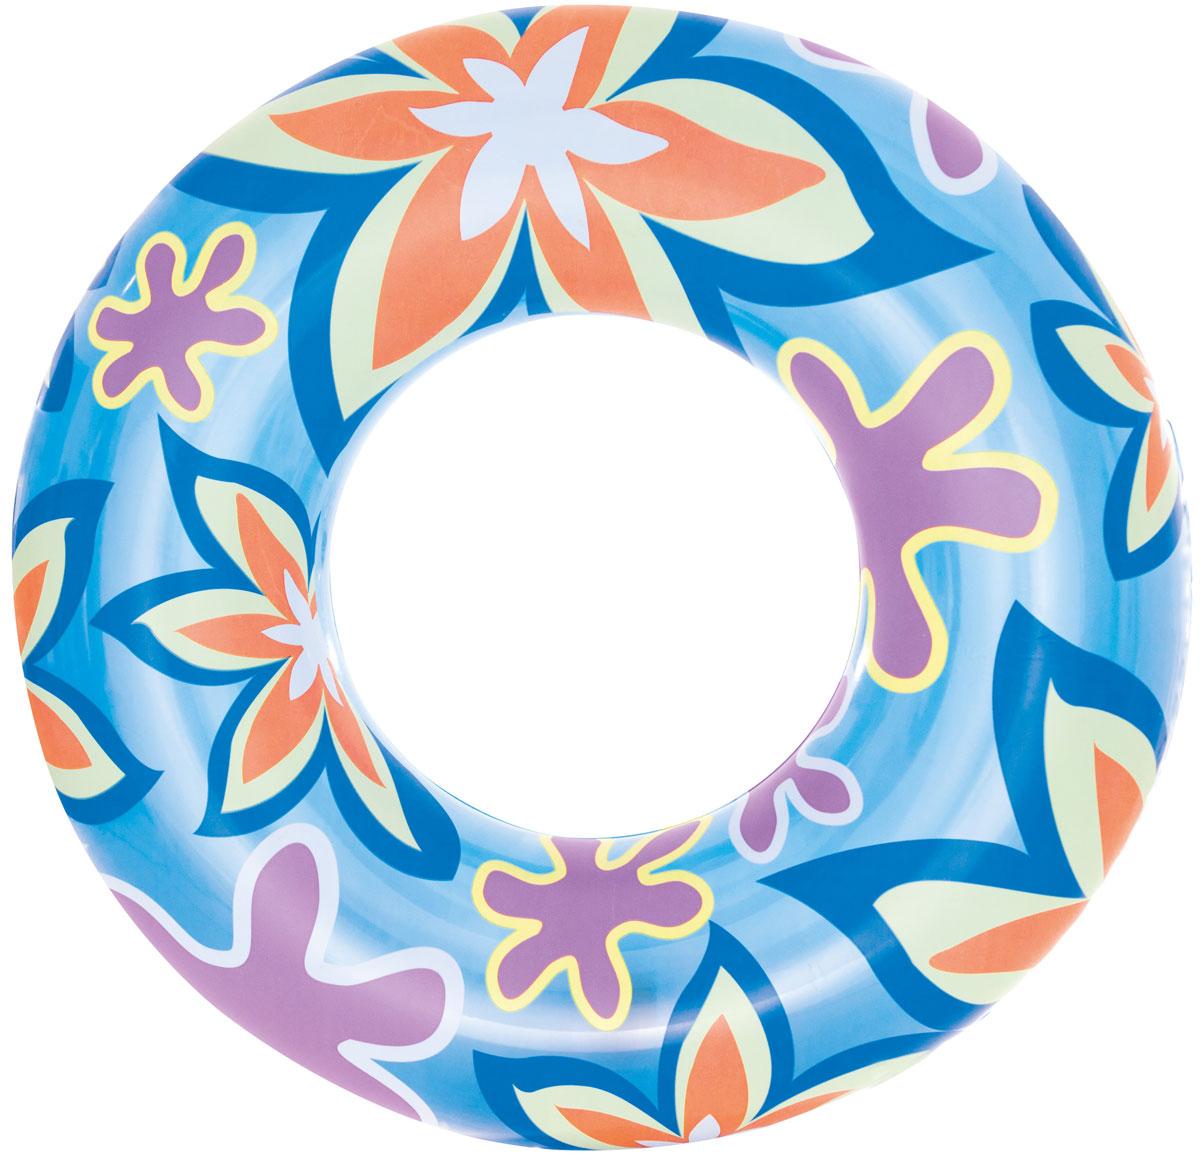 Bestway Круг для плавания  Дизайнерский . 36057_N -  Круги для купания